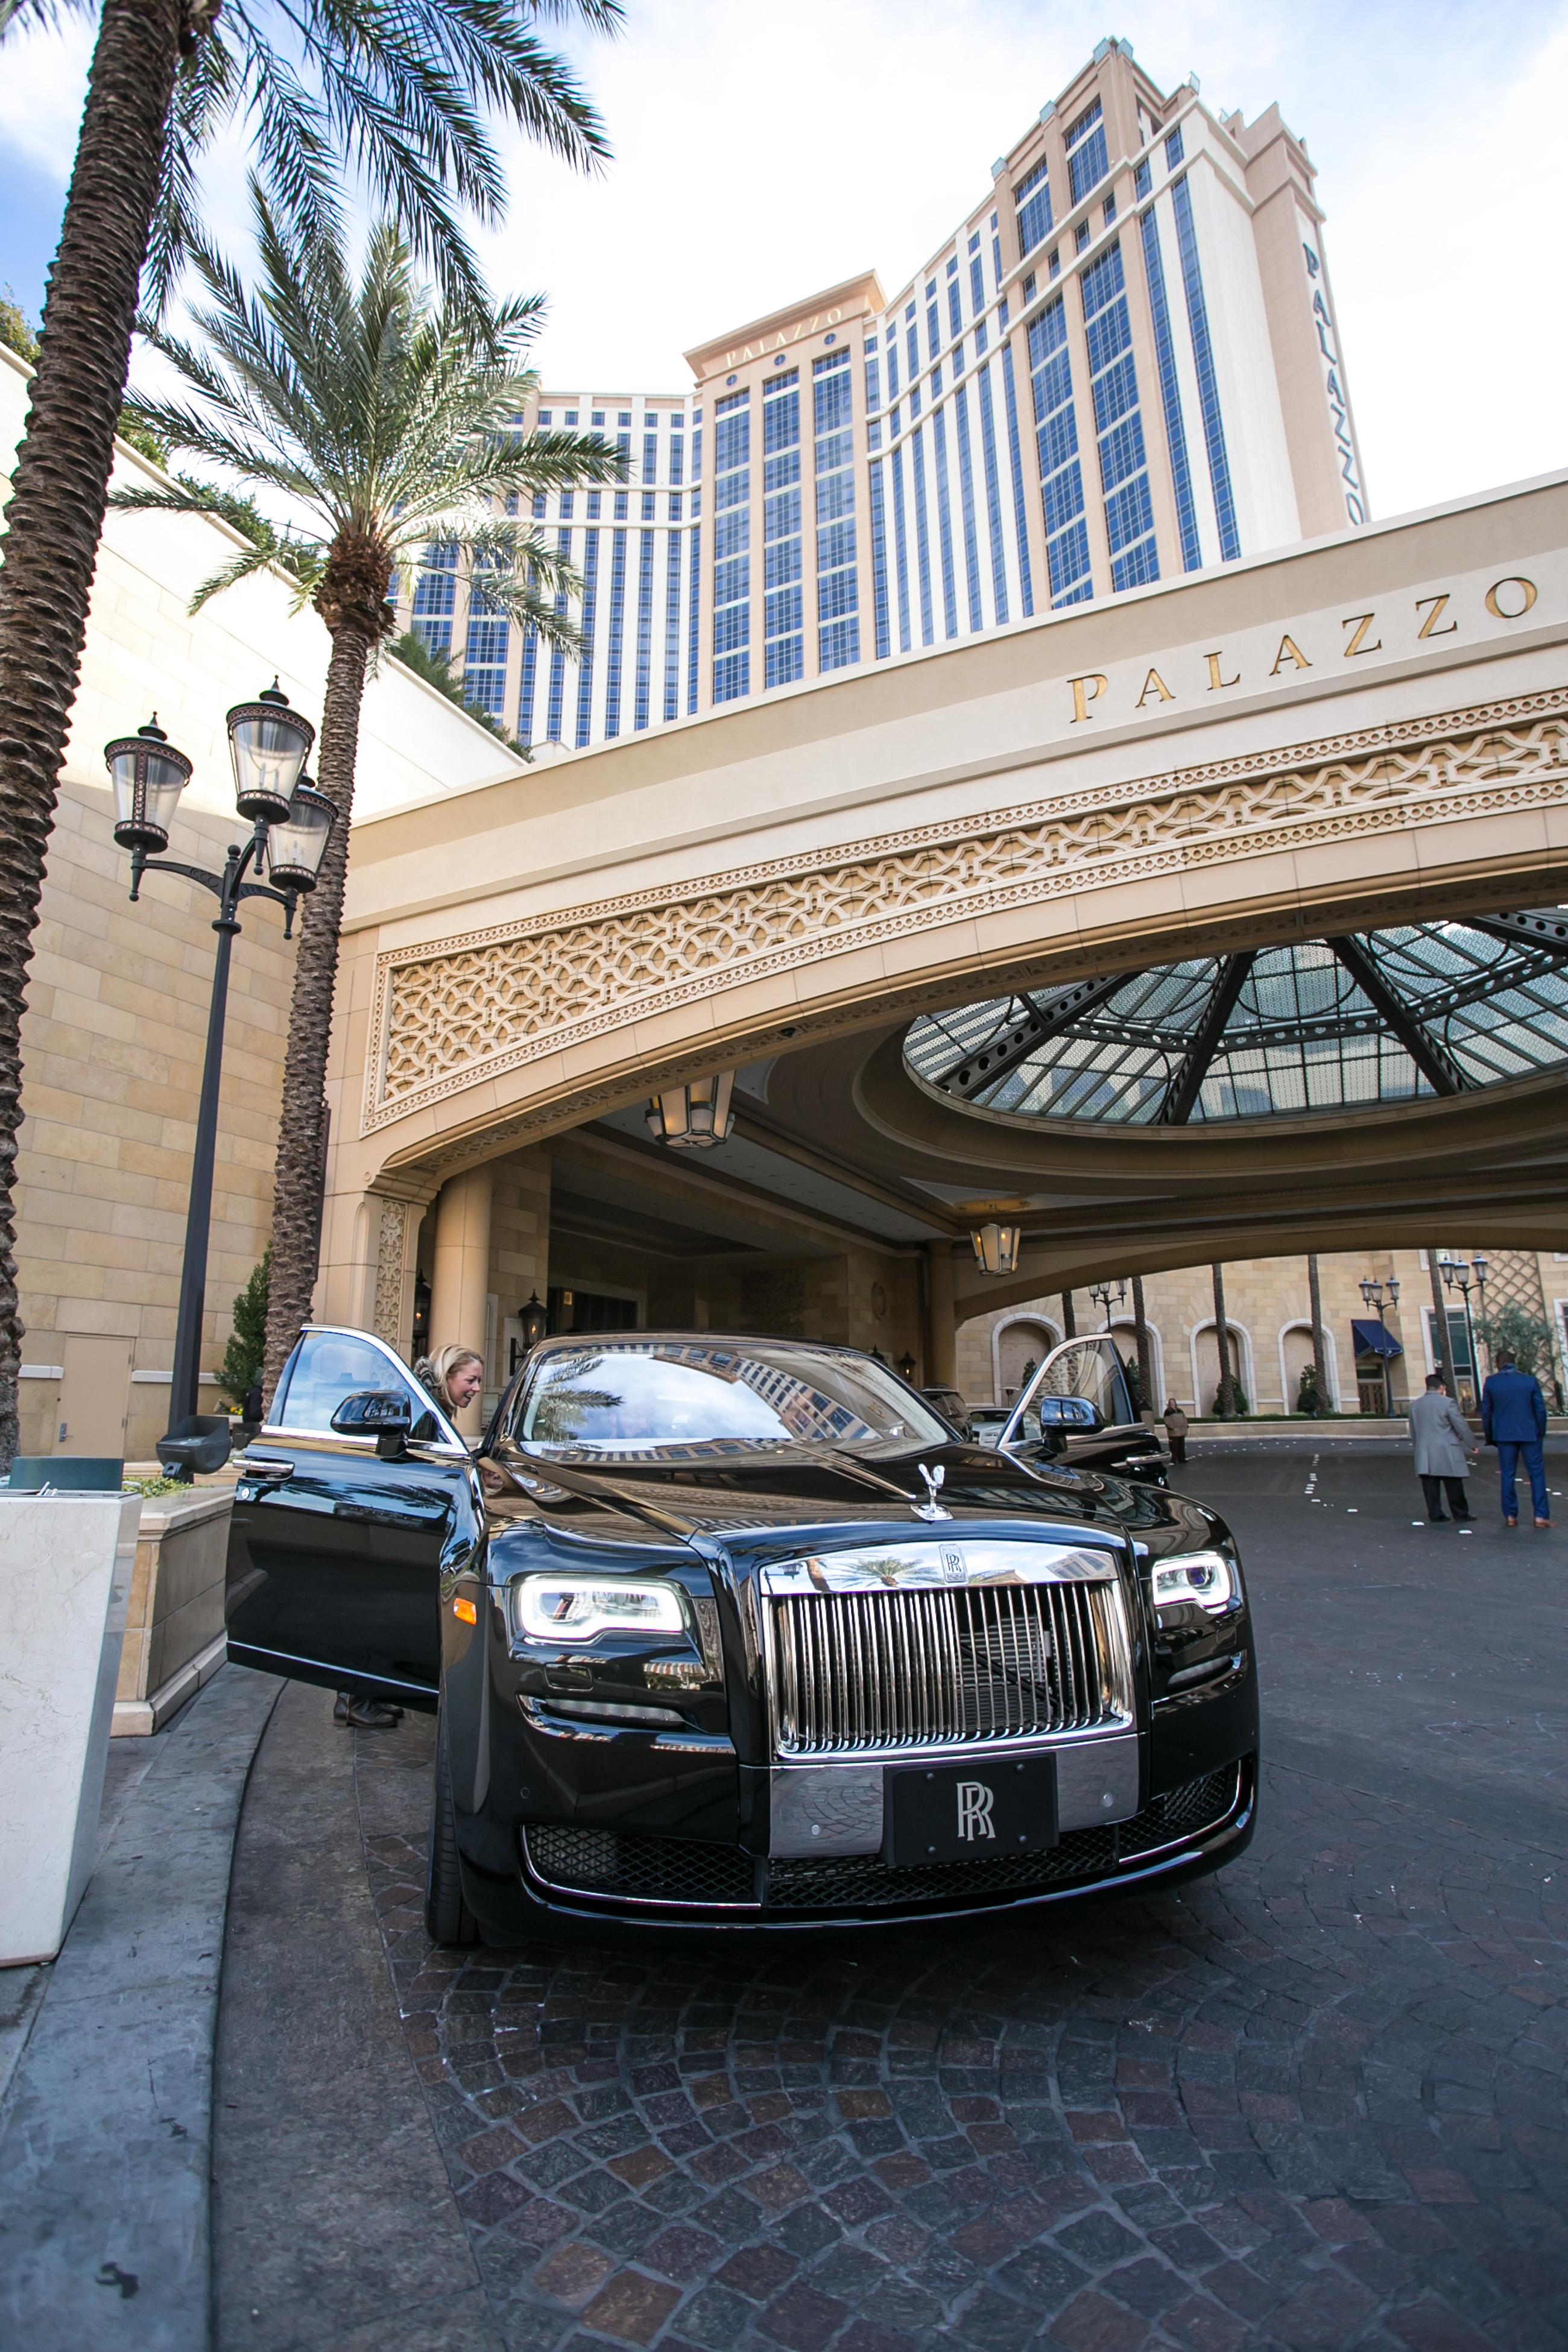 Rolls-Royce Phantom - Palazzo Hotel